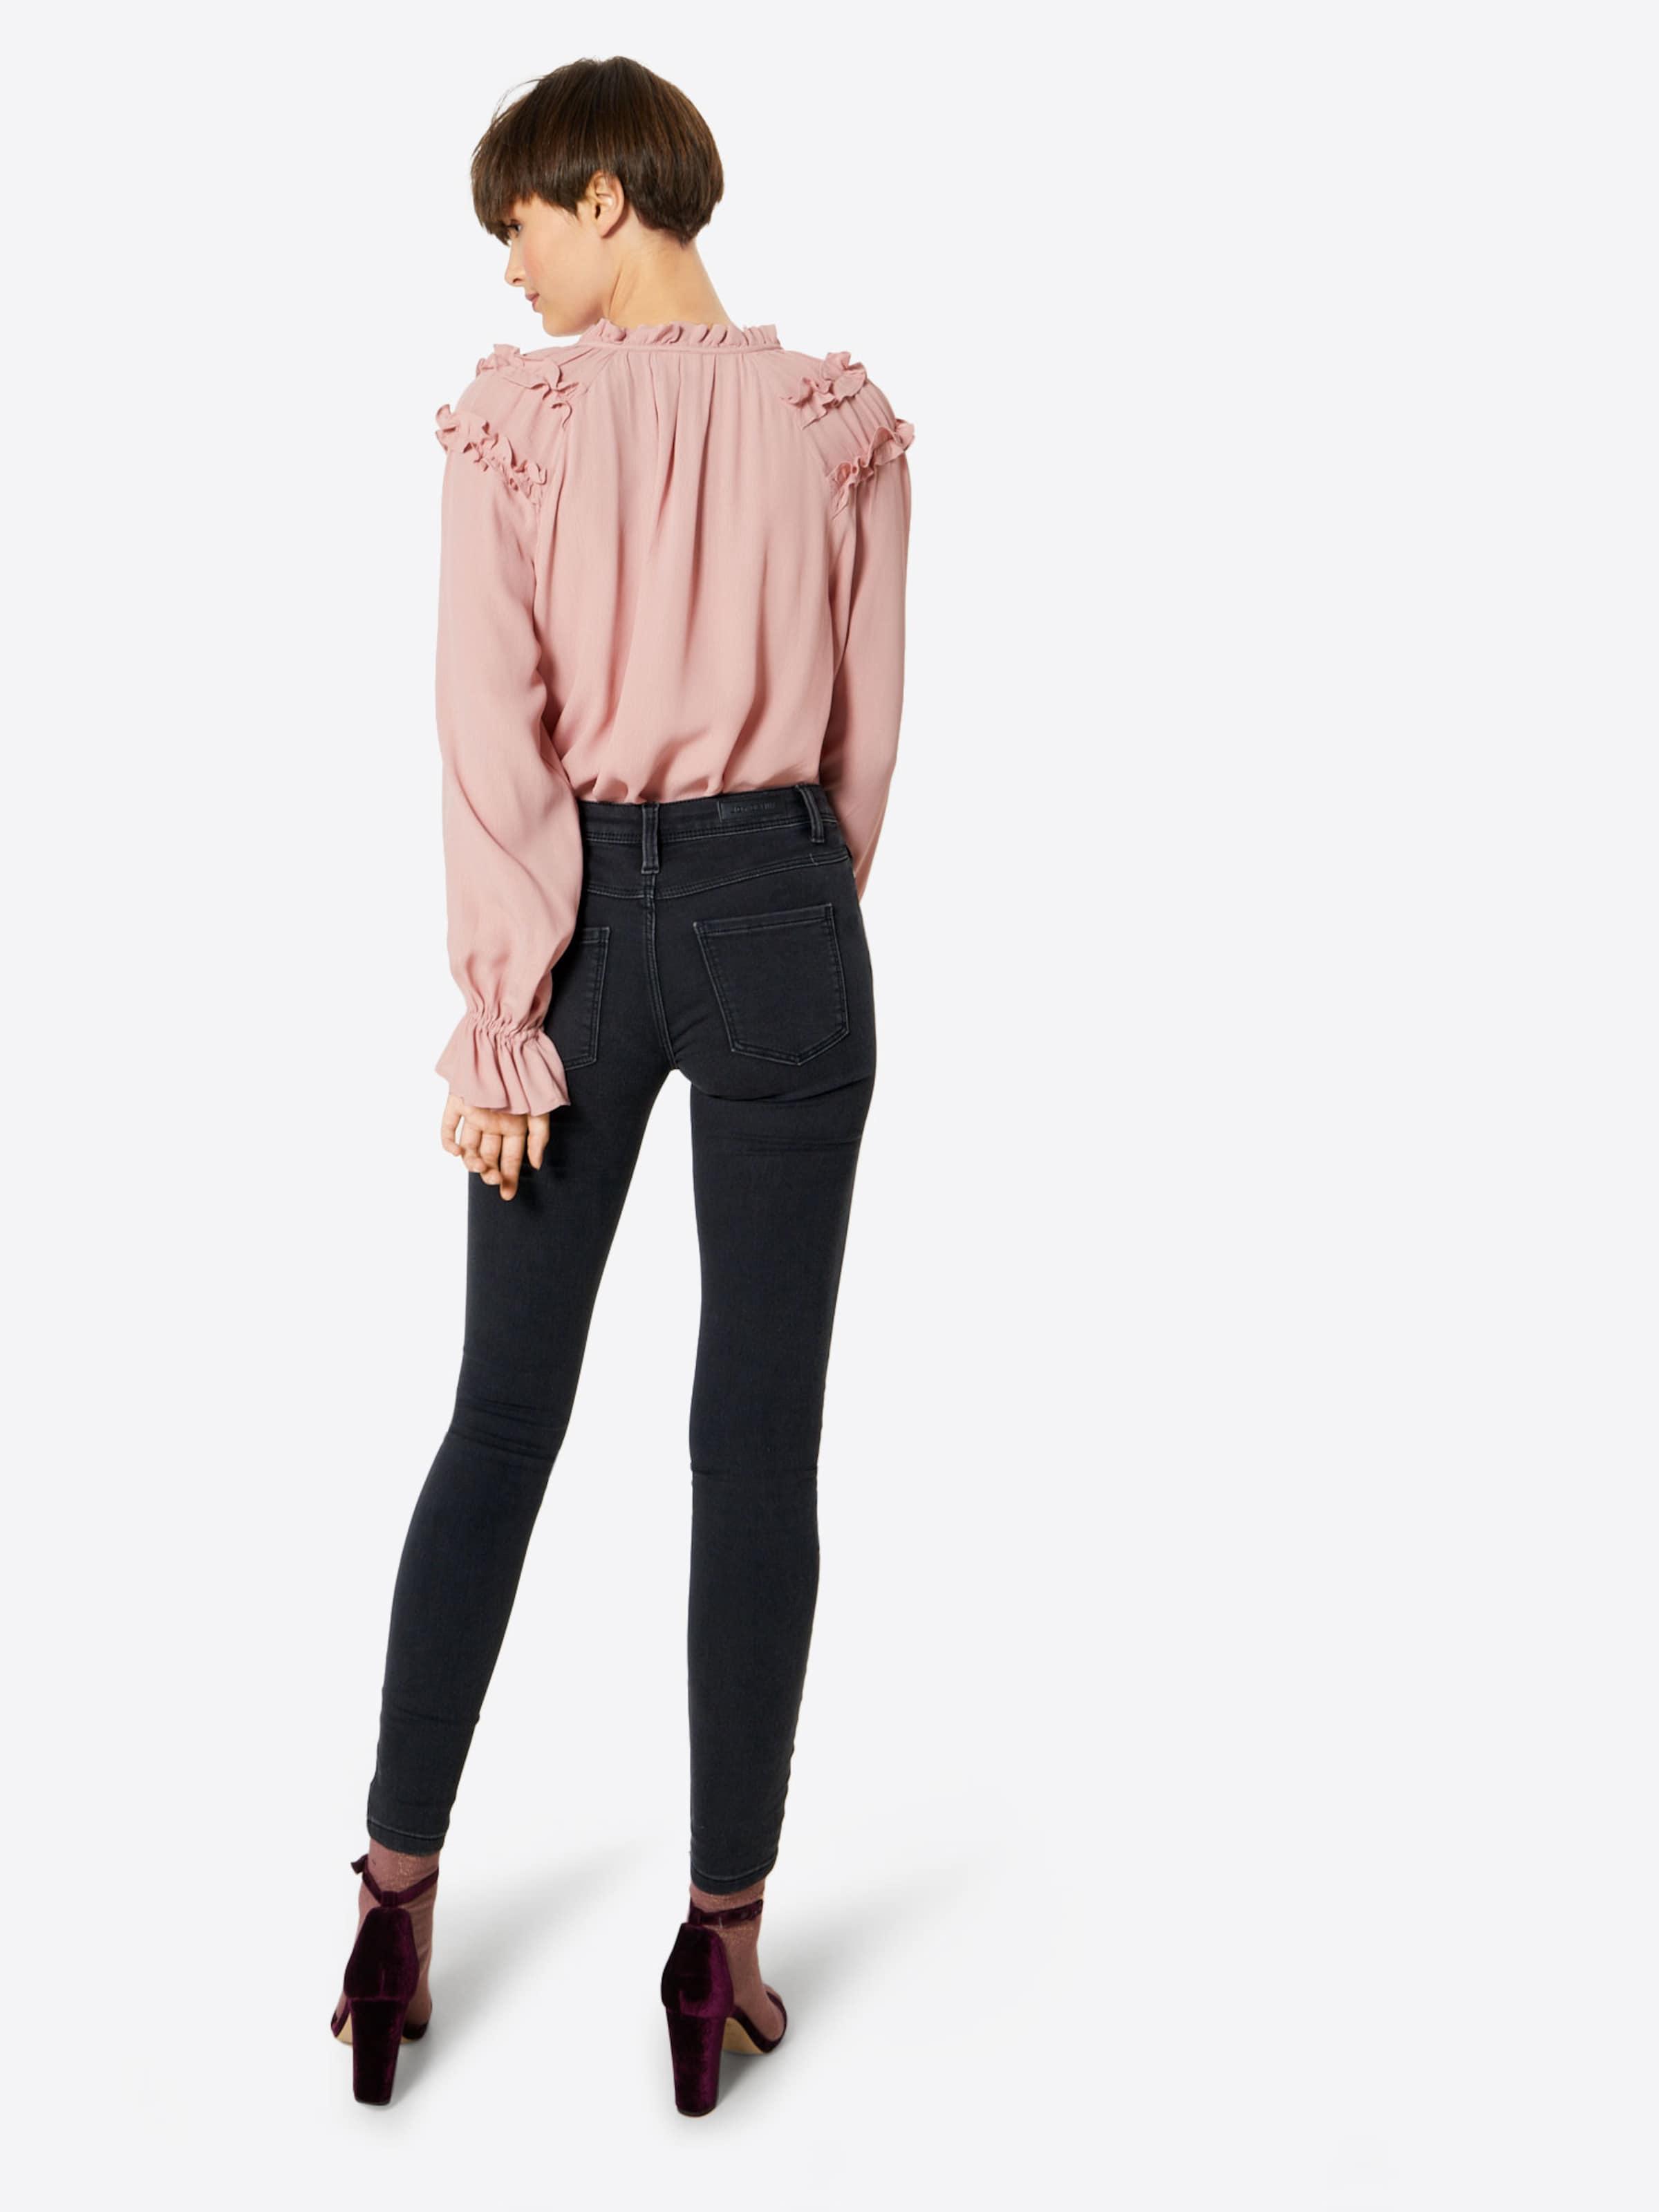 Jacqueline Denim Black De In Yong Jeans bH2IeWE9YD